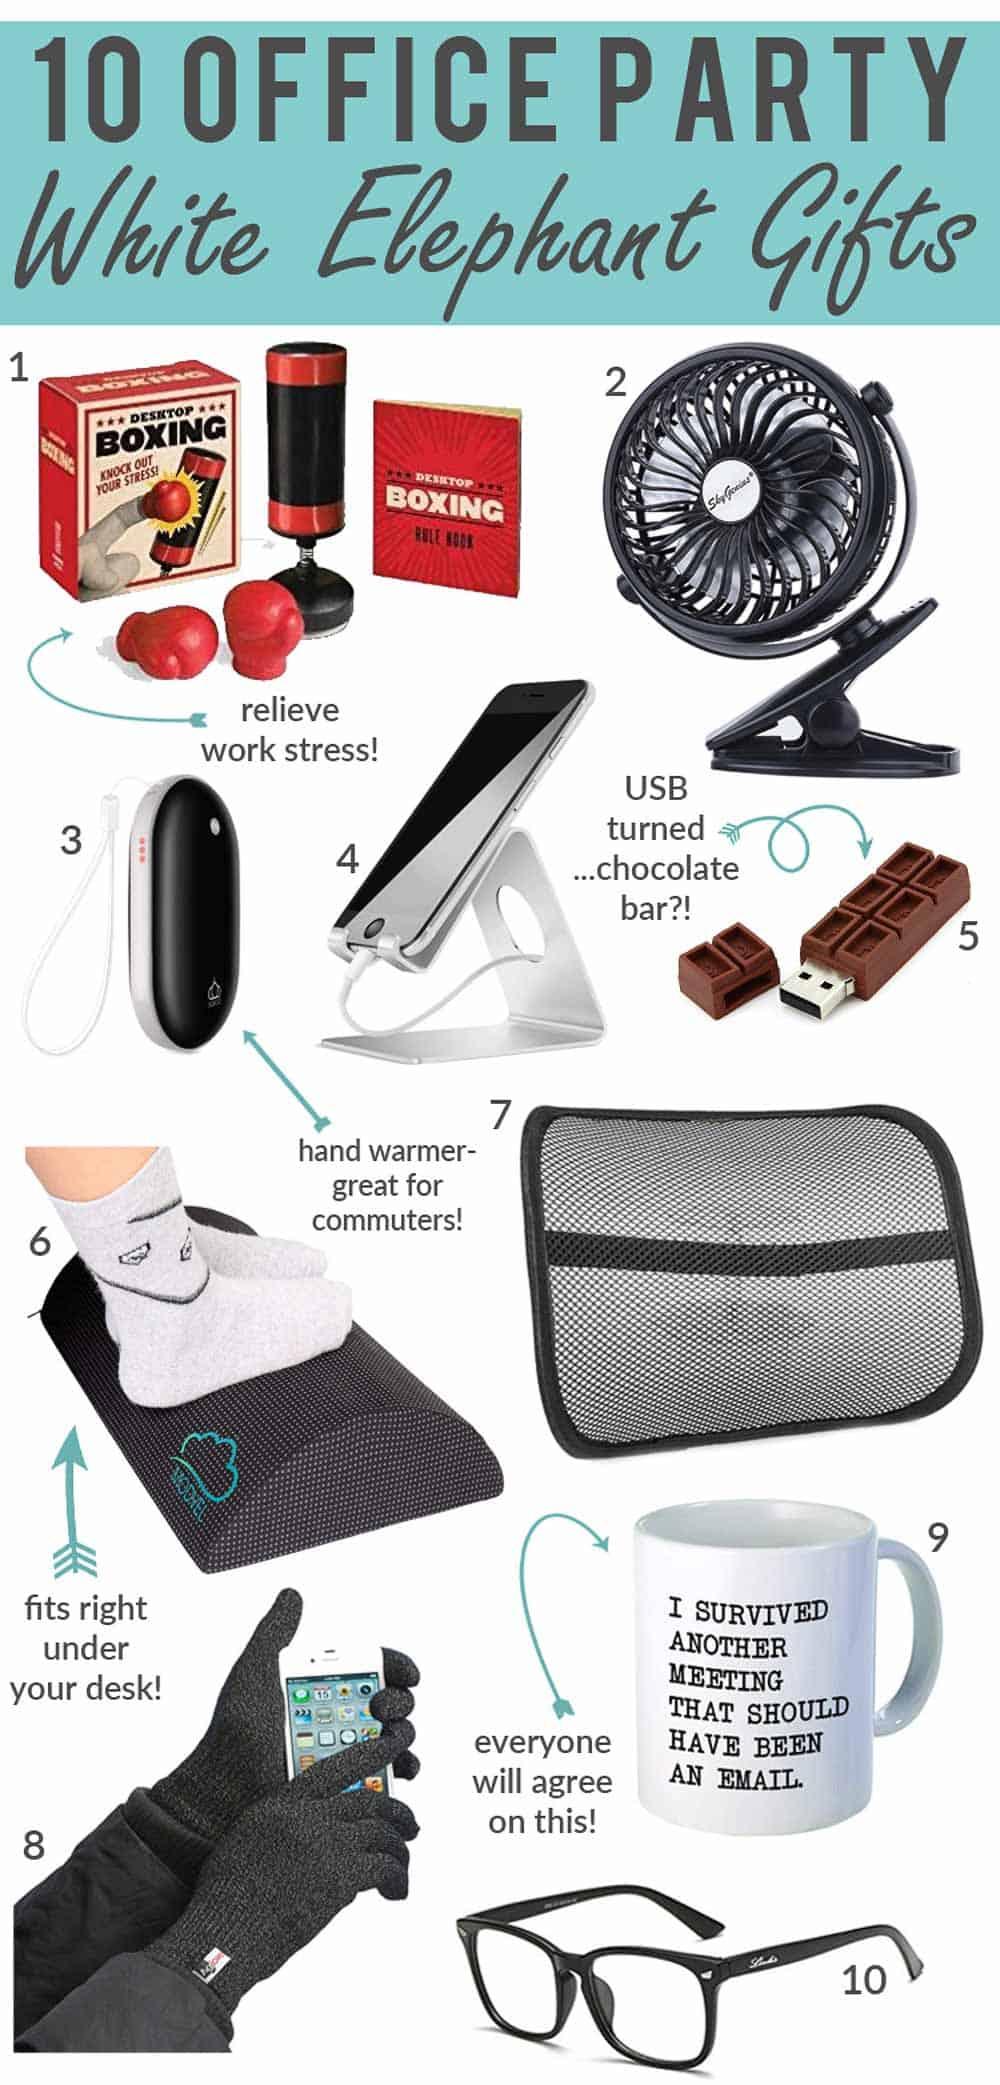 20 Office Party White Elephant Gift Ideas   Happy Money Saver